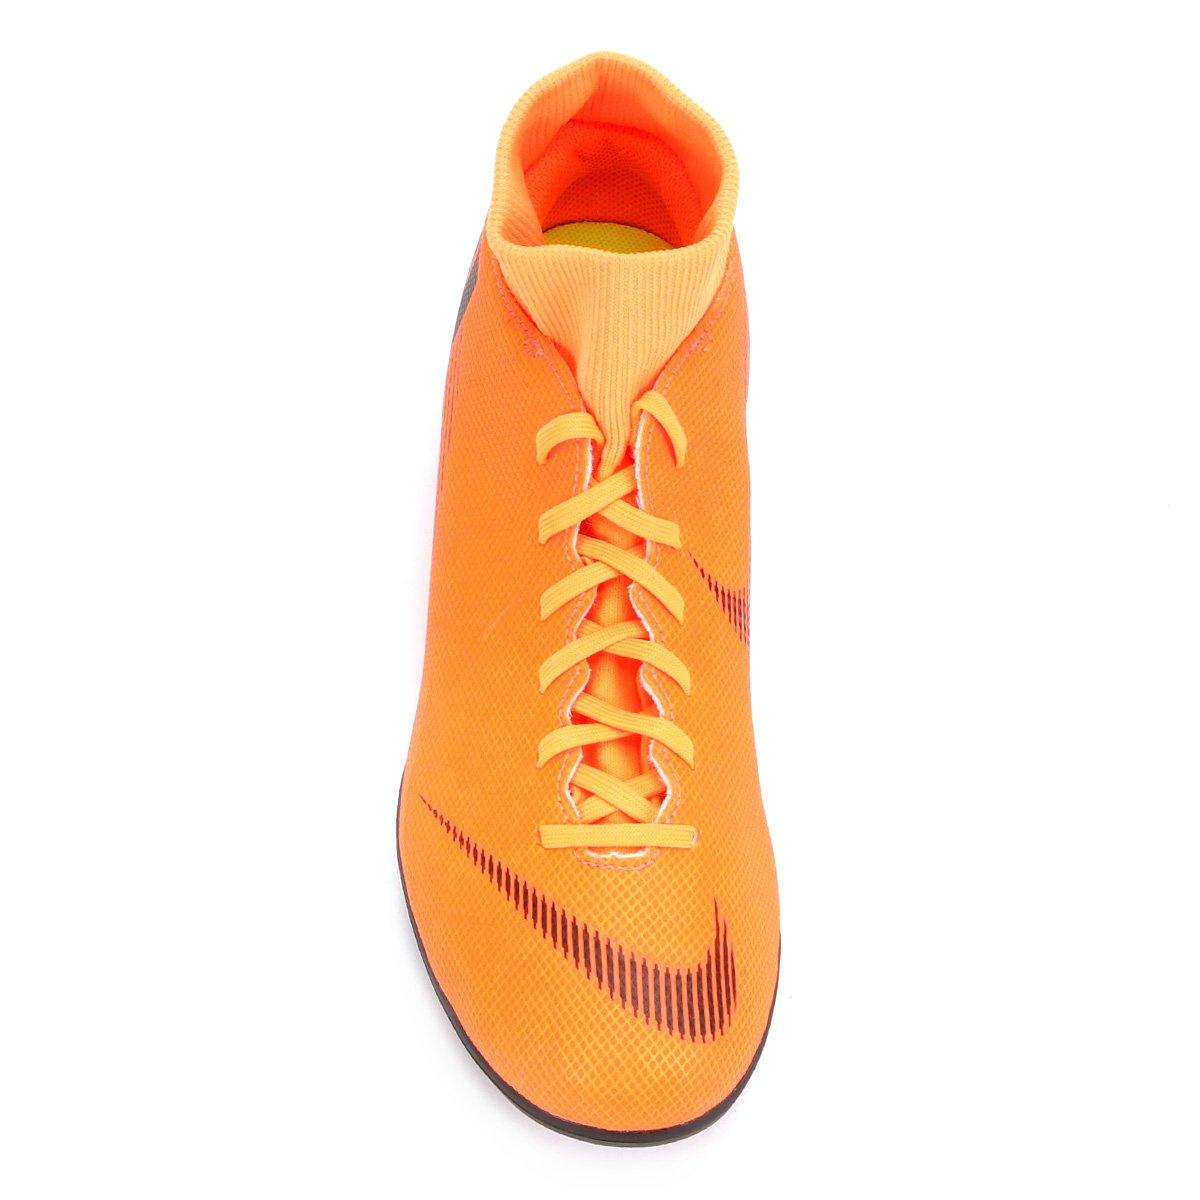 Chuteira Campo Nike Mercurial Superfly 6 Club - Laranja e Preto ... 144a8d6e4e4aa